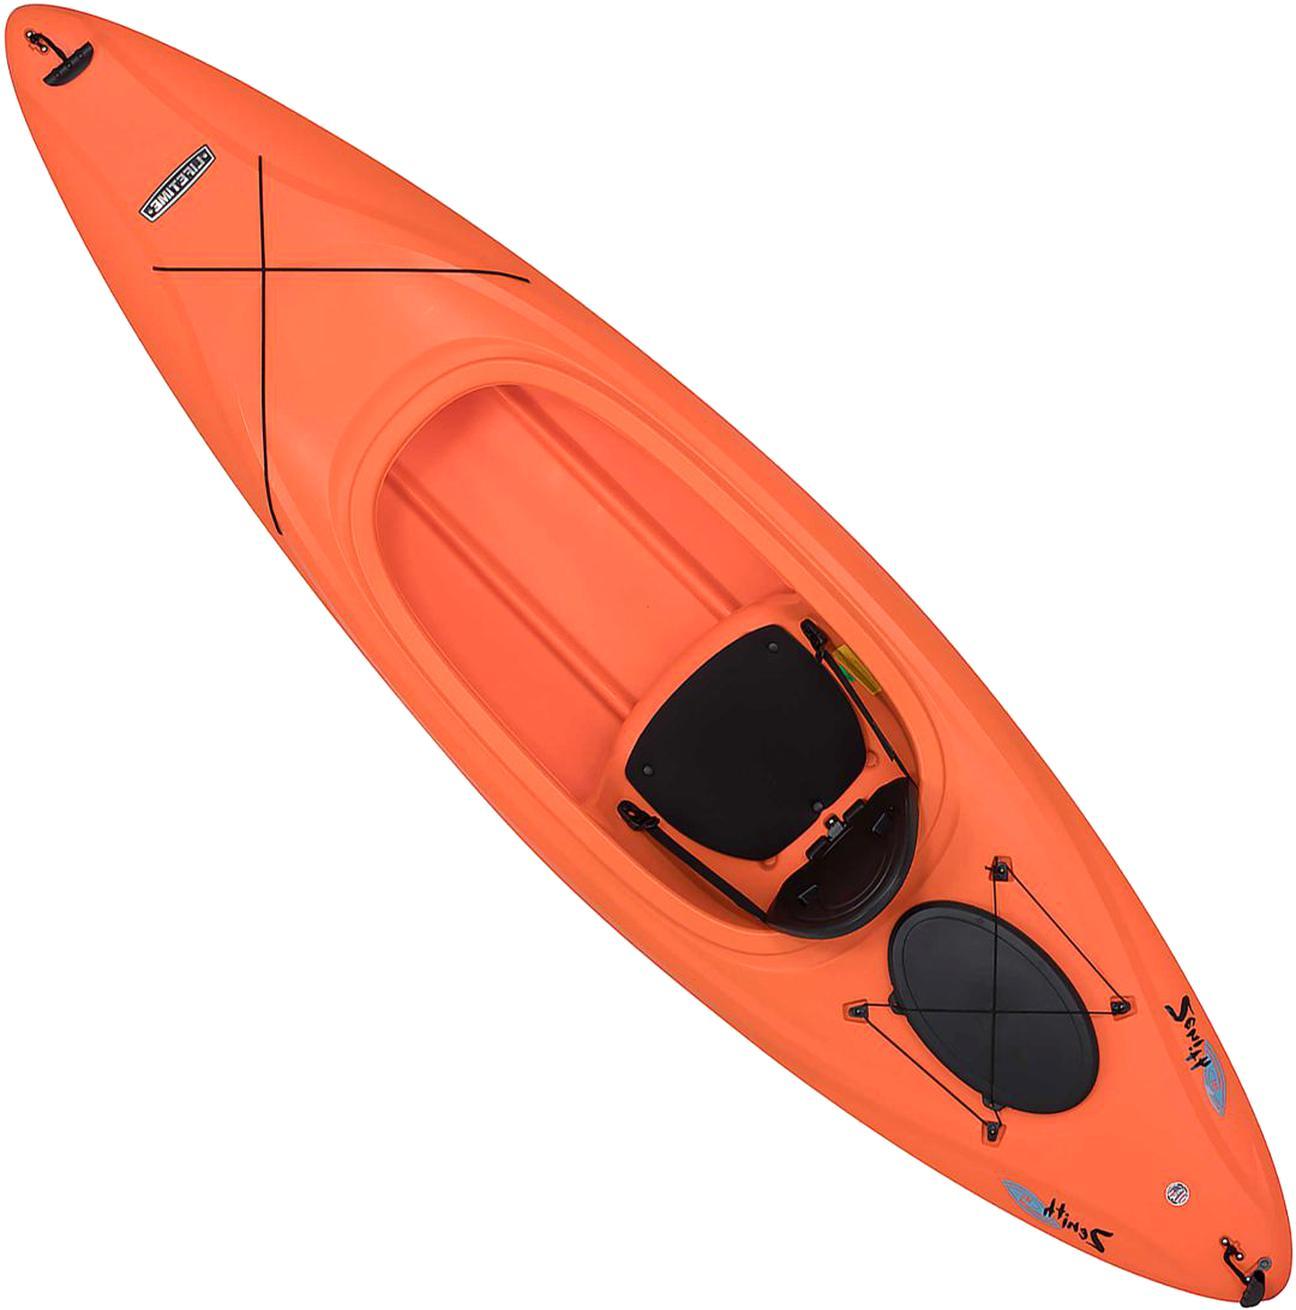 Craigslist Fort Myers Kayaks For Sale - Kayak Explorer